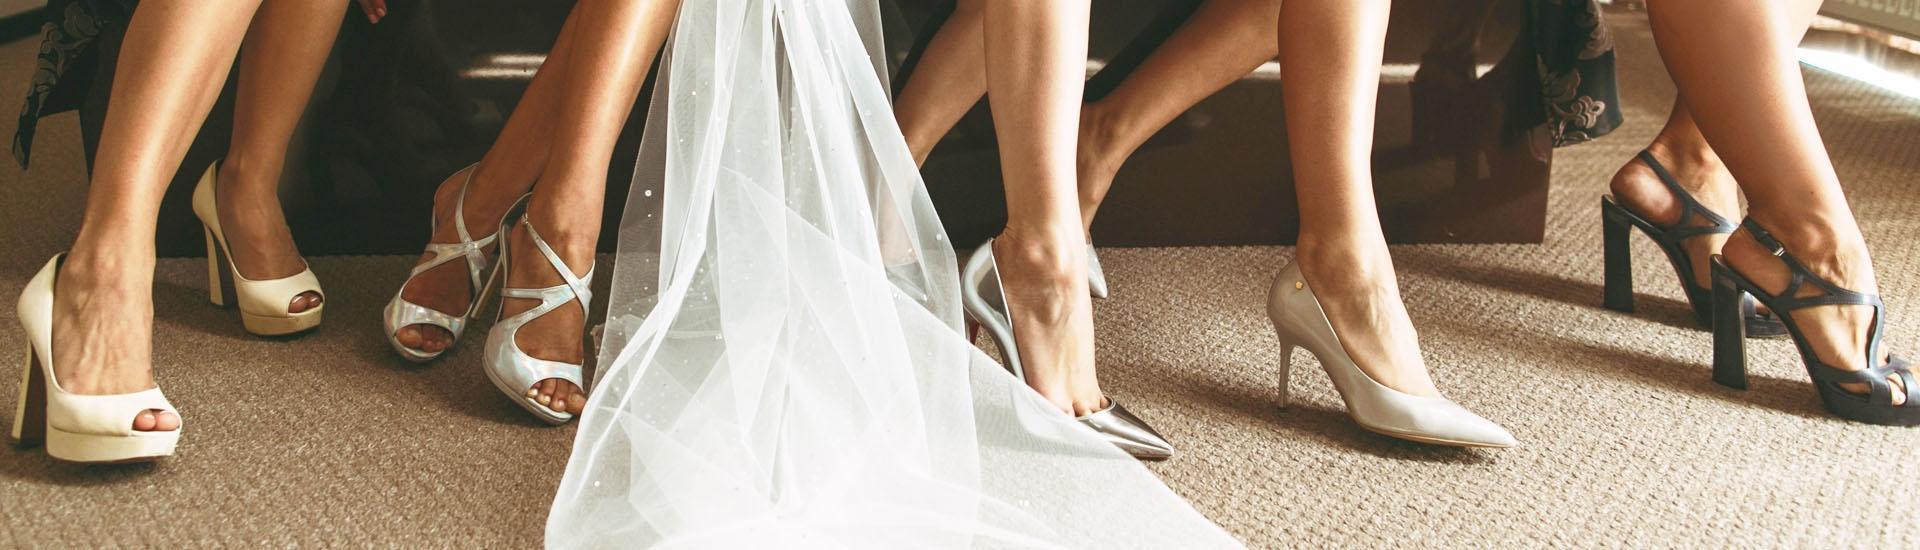 Scarpe Sposa Como.Scarpe Da Cerimonia Como Dea Spose Atelier Abiti Da Sposa